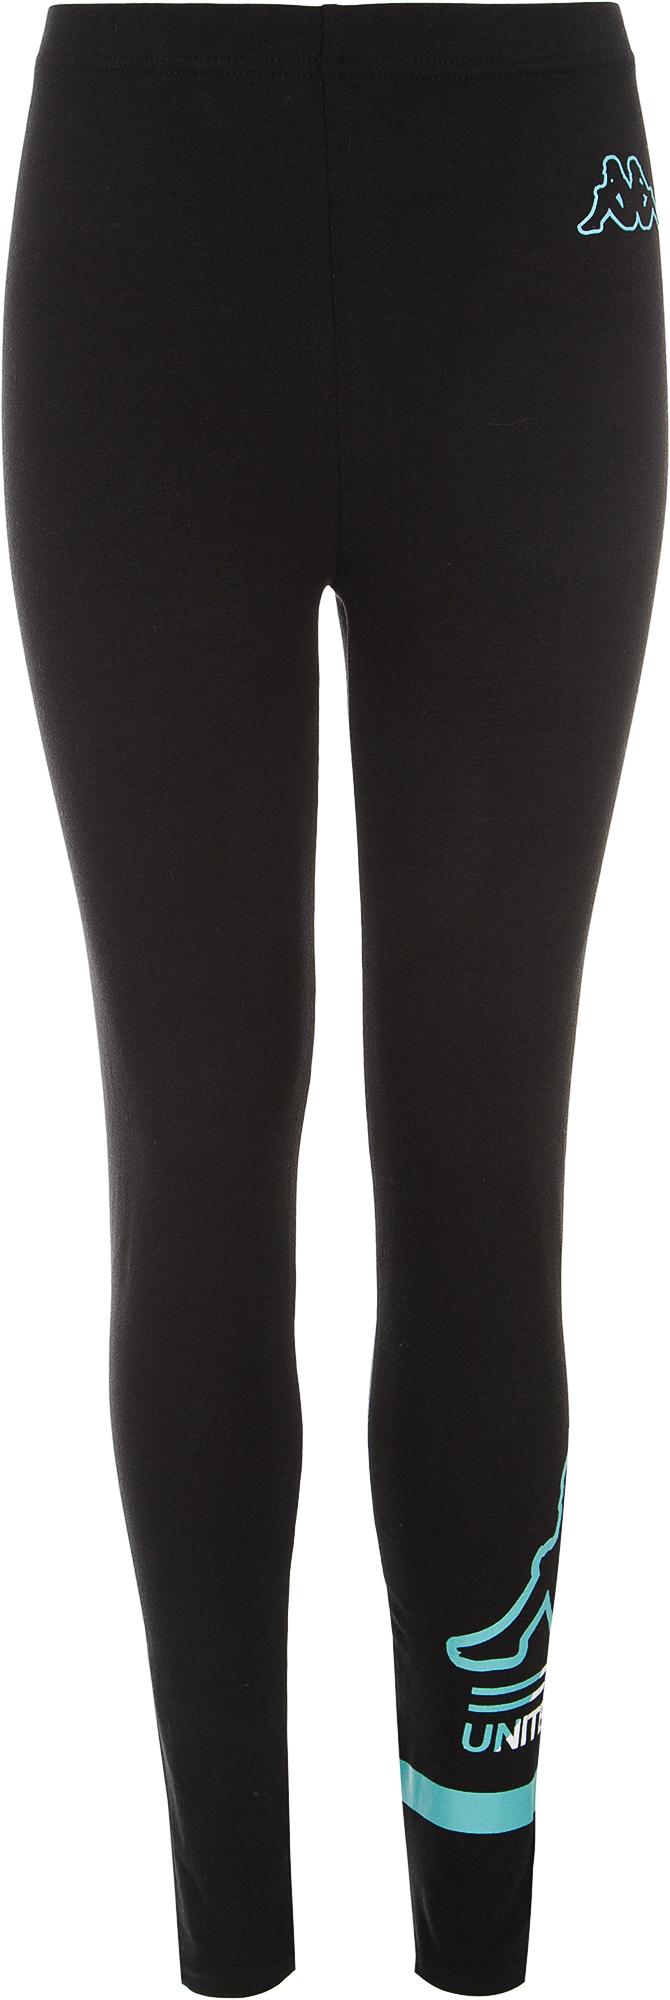 Kappa Легинсы для девочек Kappa, размер 170 kappa брюки для девочек kappa размер 134